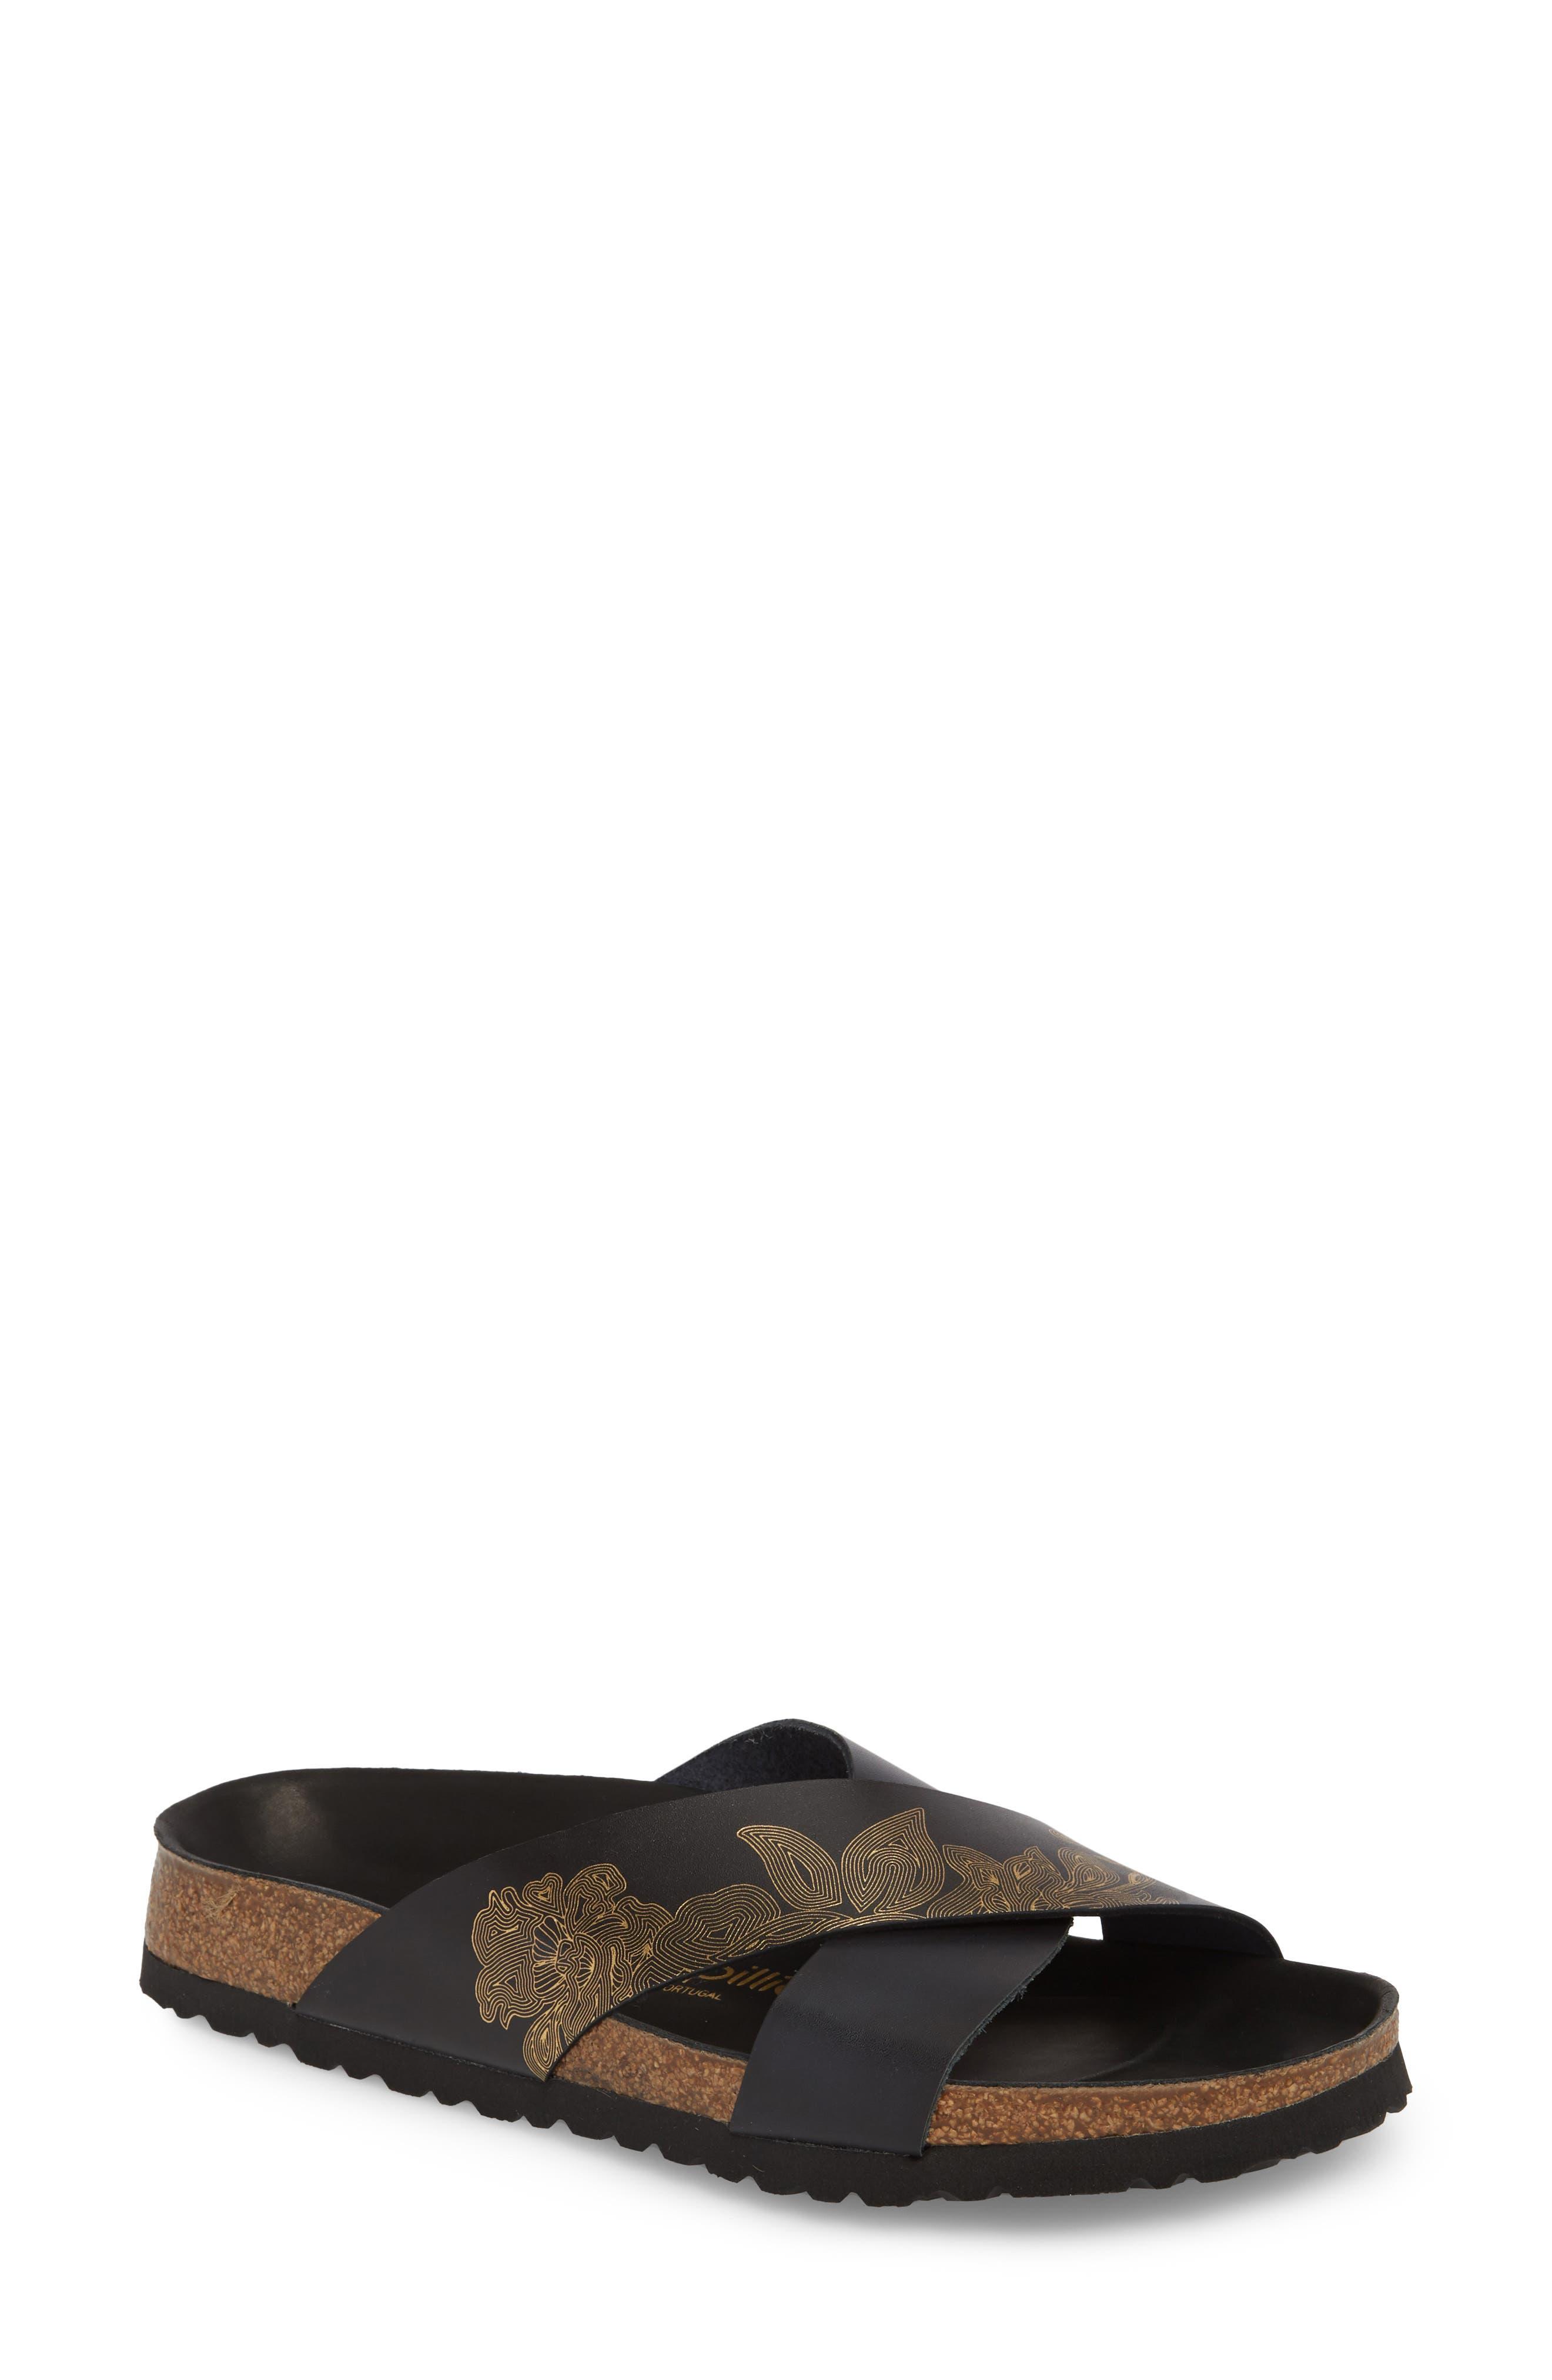 Papillio by Birkenstock Daytona Hex Slide Sandal,                             Main thumbnail 1, color,                             Ornaments Black Leather